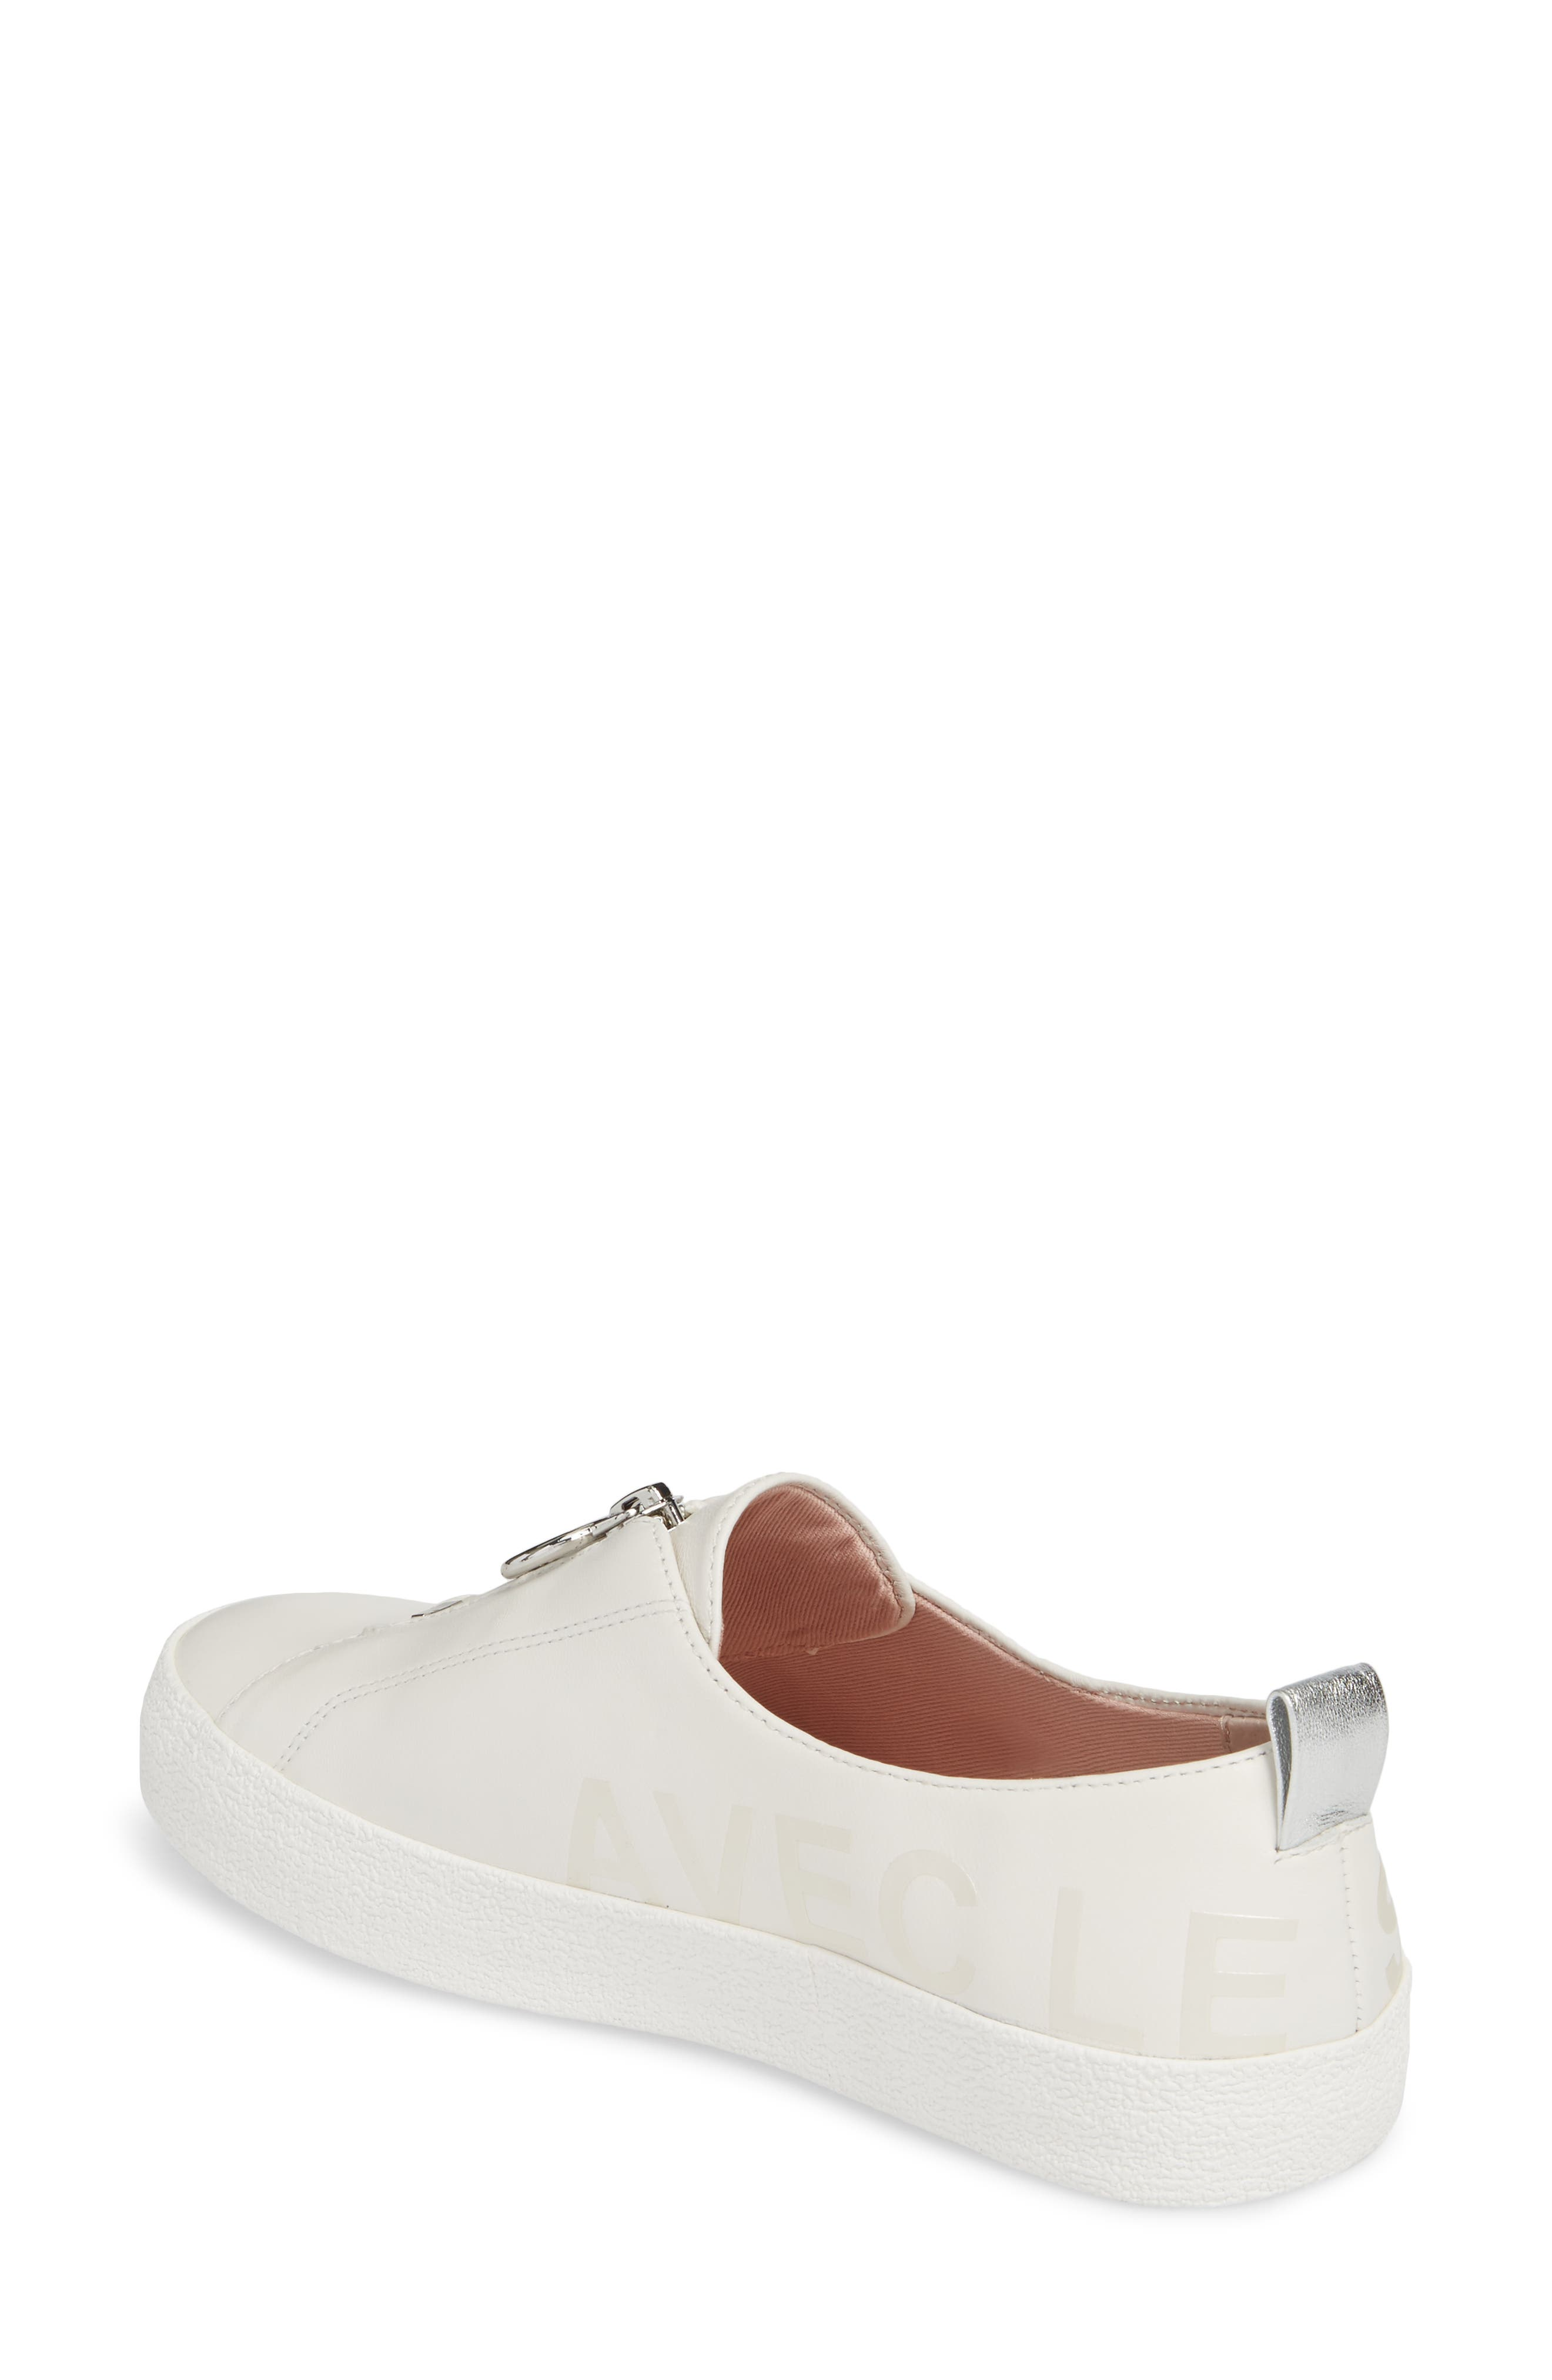 Sasha Zip Sneaker,                             Alternate thumbnail 4, color,